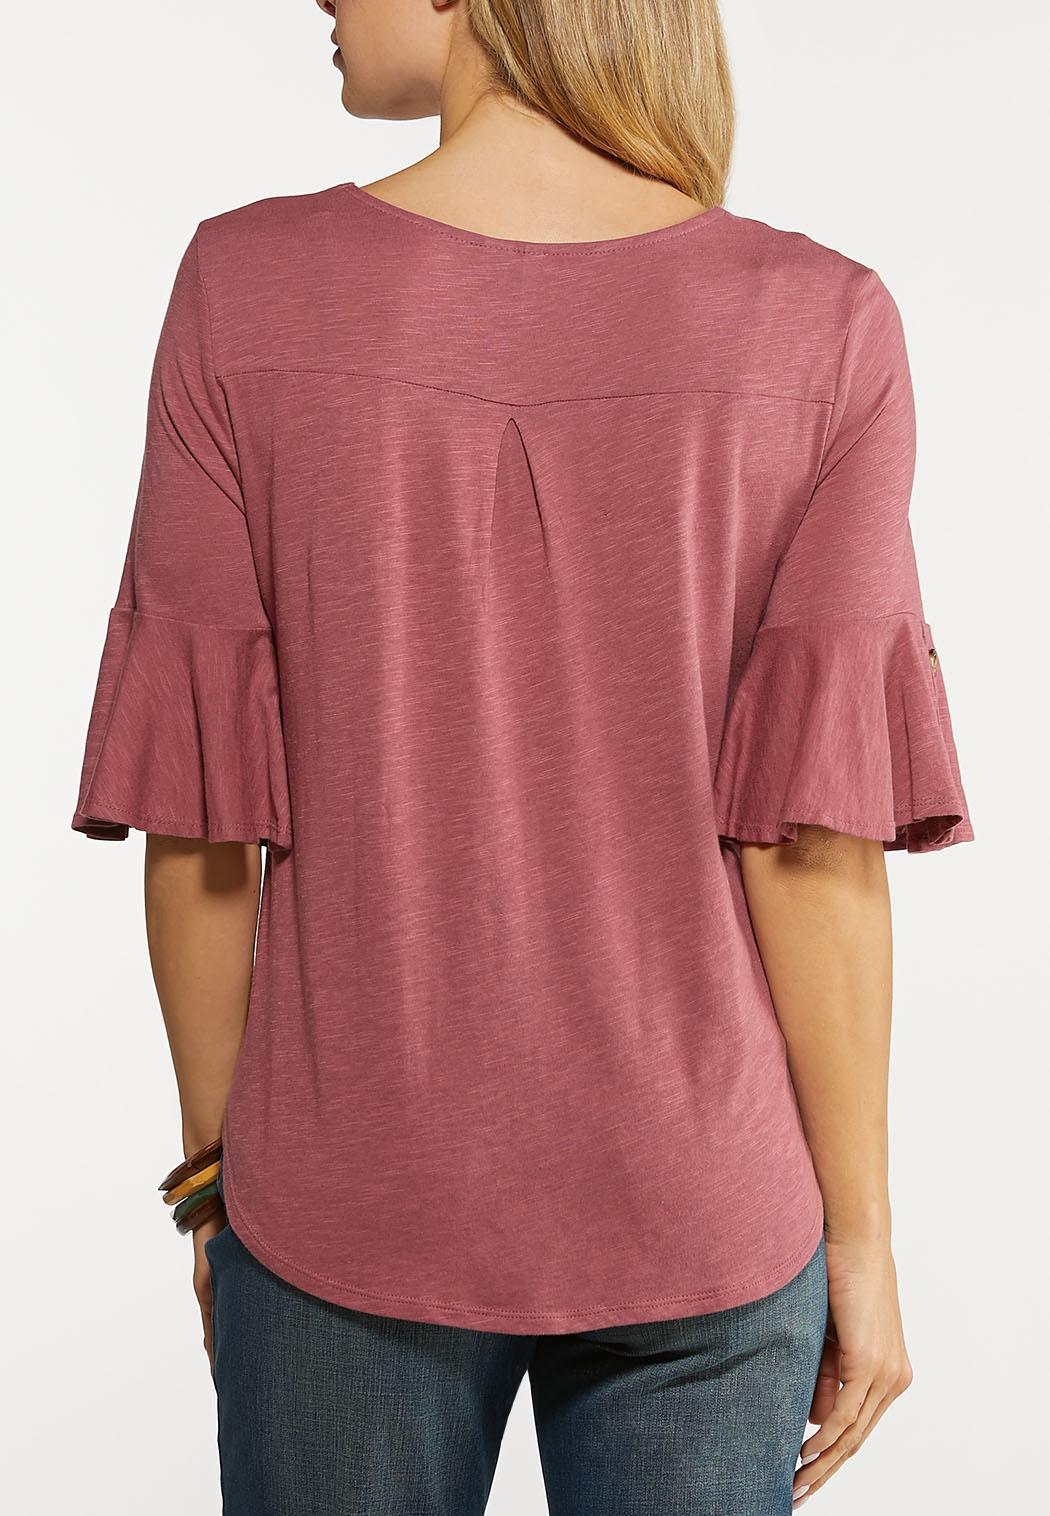 Plus Size Flutter Sleeve Top (Item #44113356)